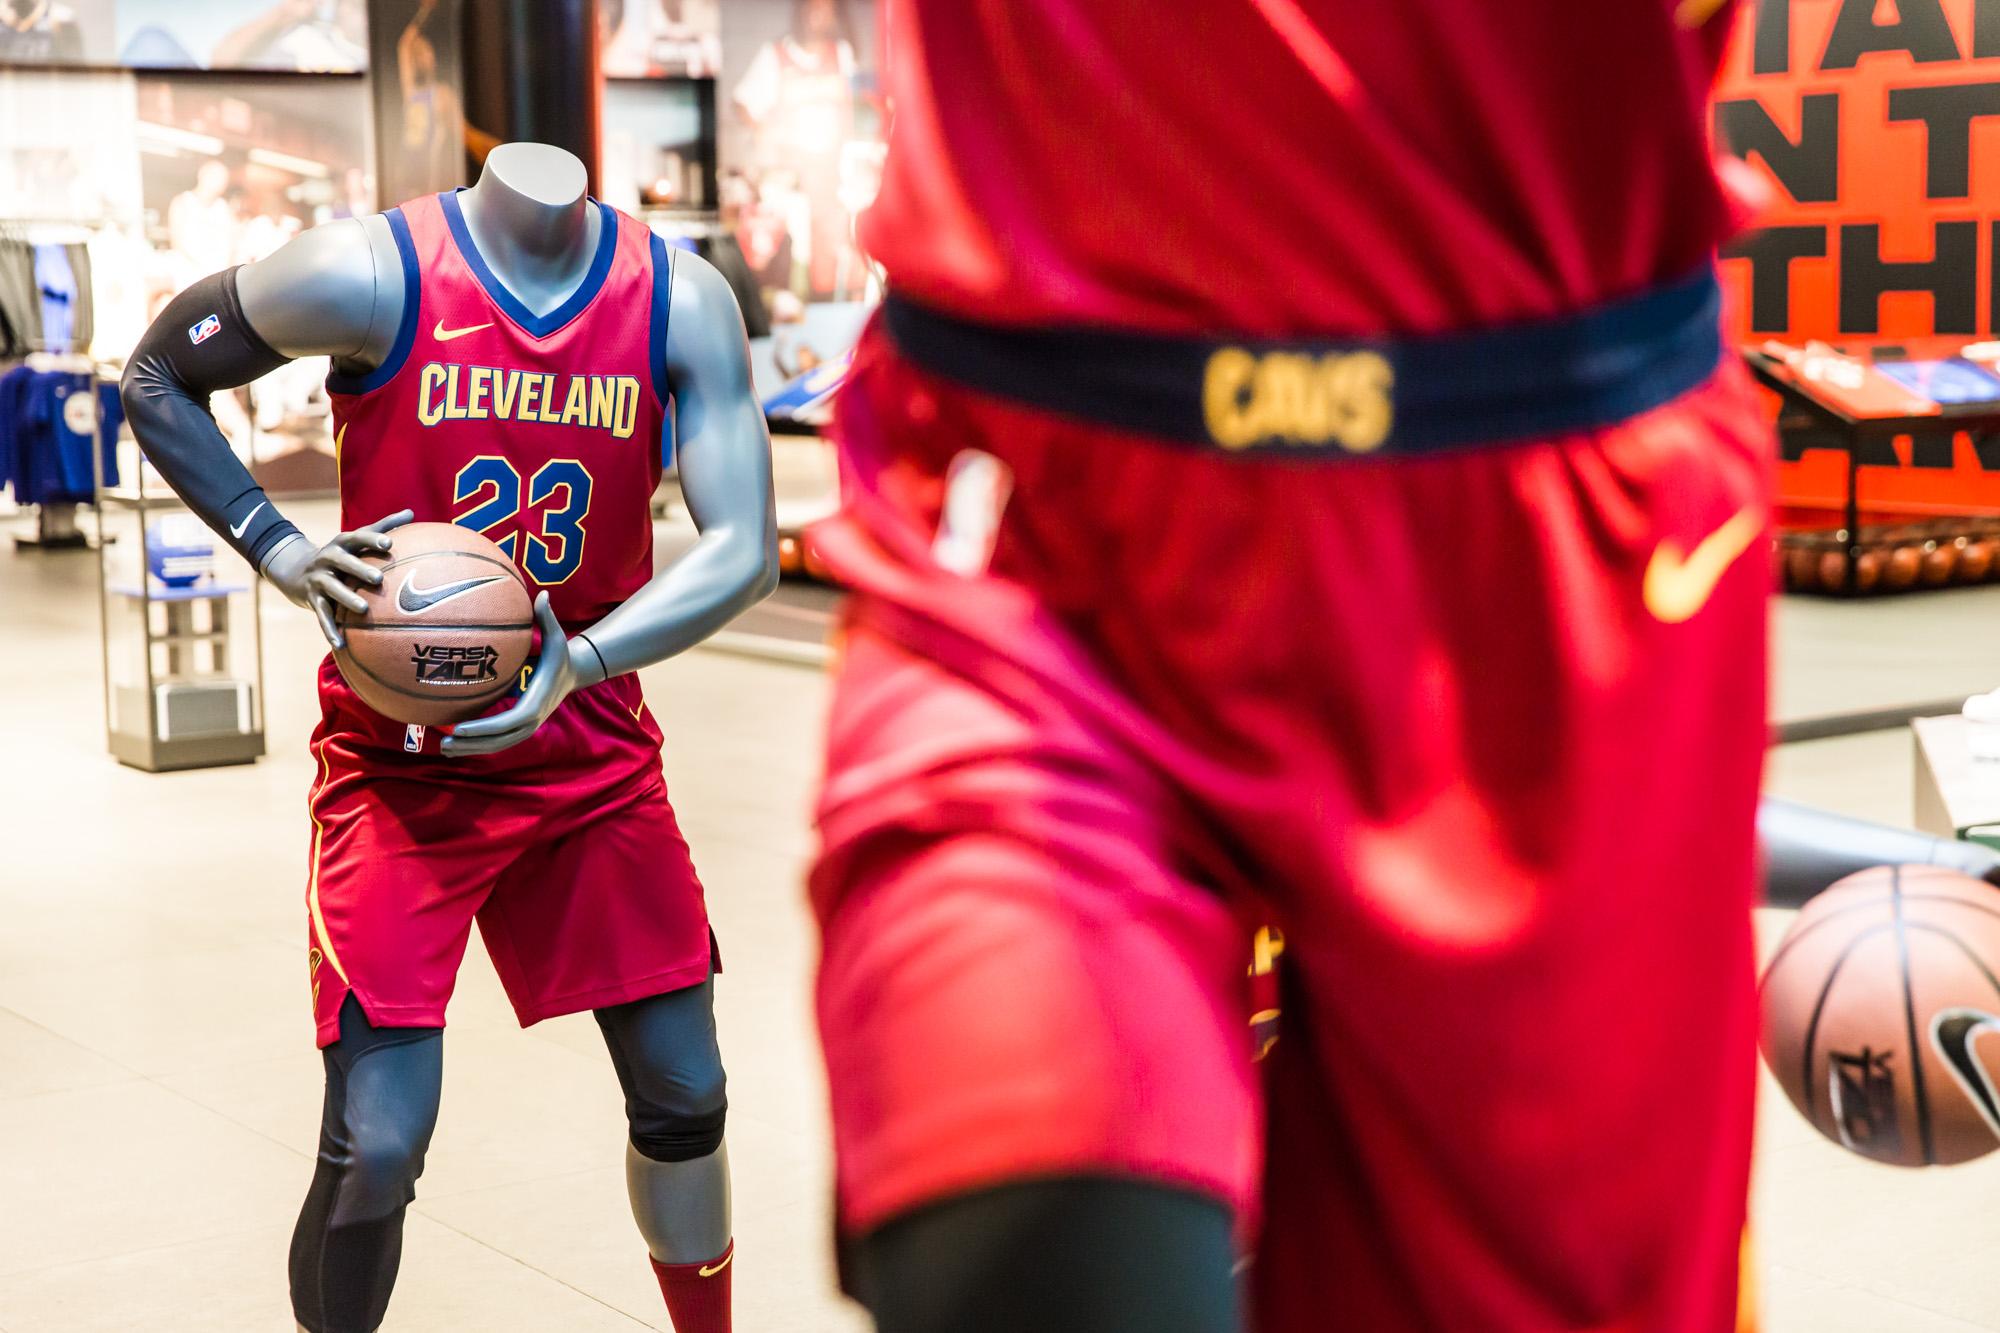 TDM_3242 - Nike - NBA Launch - NTL - Tom D Morgan - WEB.jpg